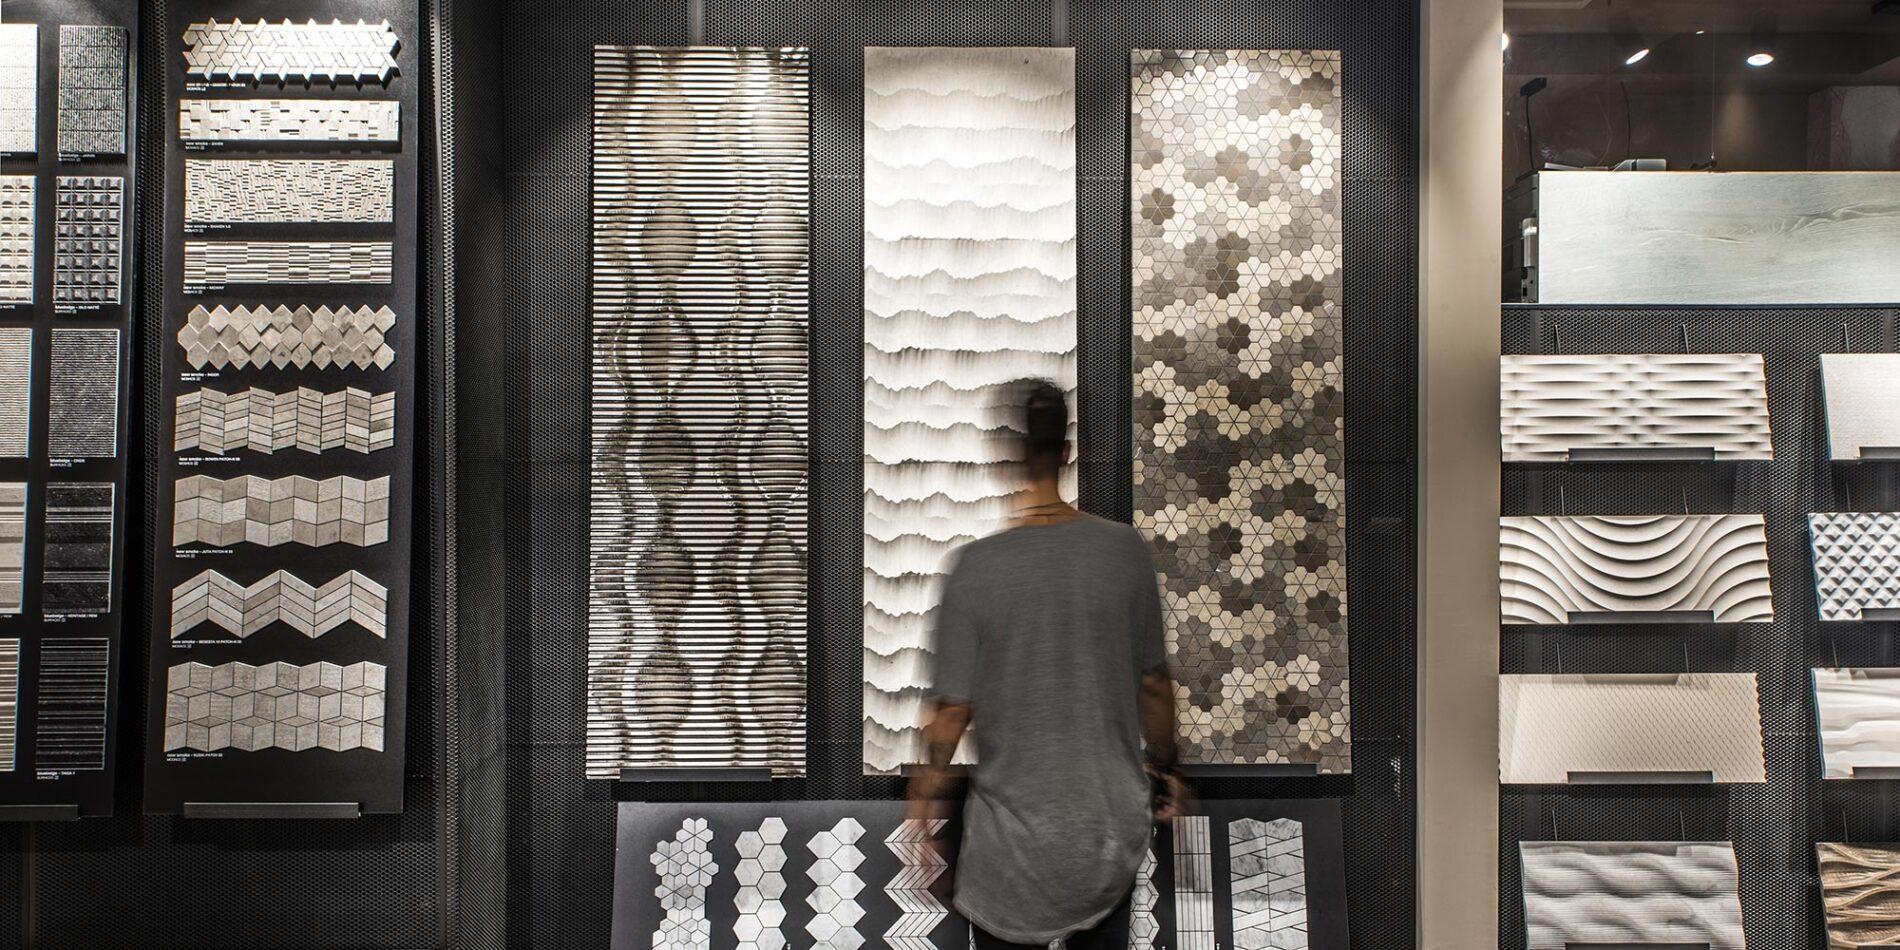 Materiales singulares, texturas sorprendentes en Barcelona